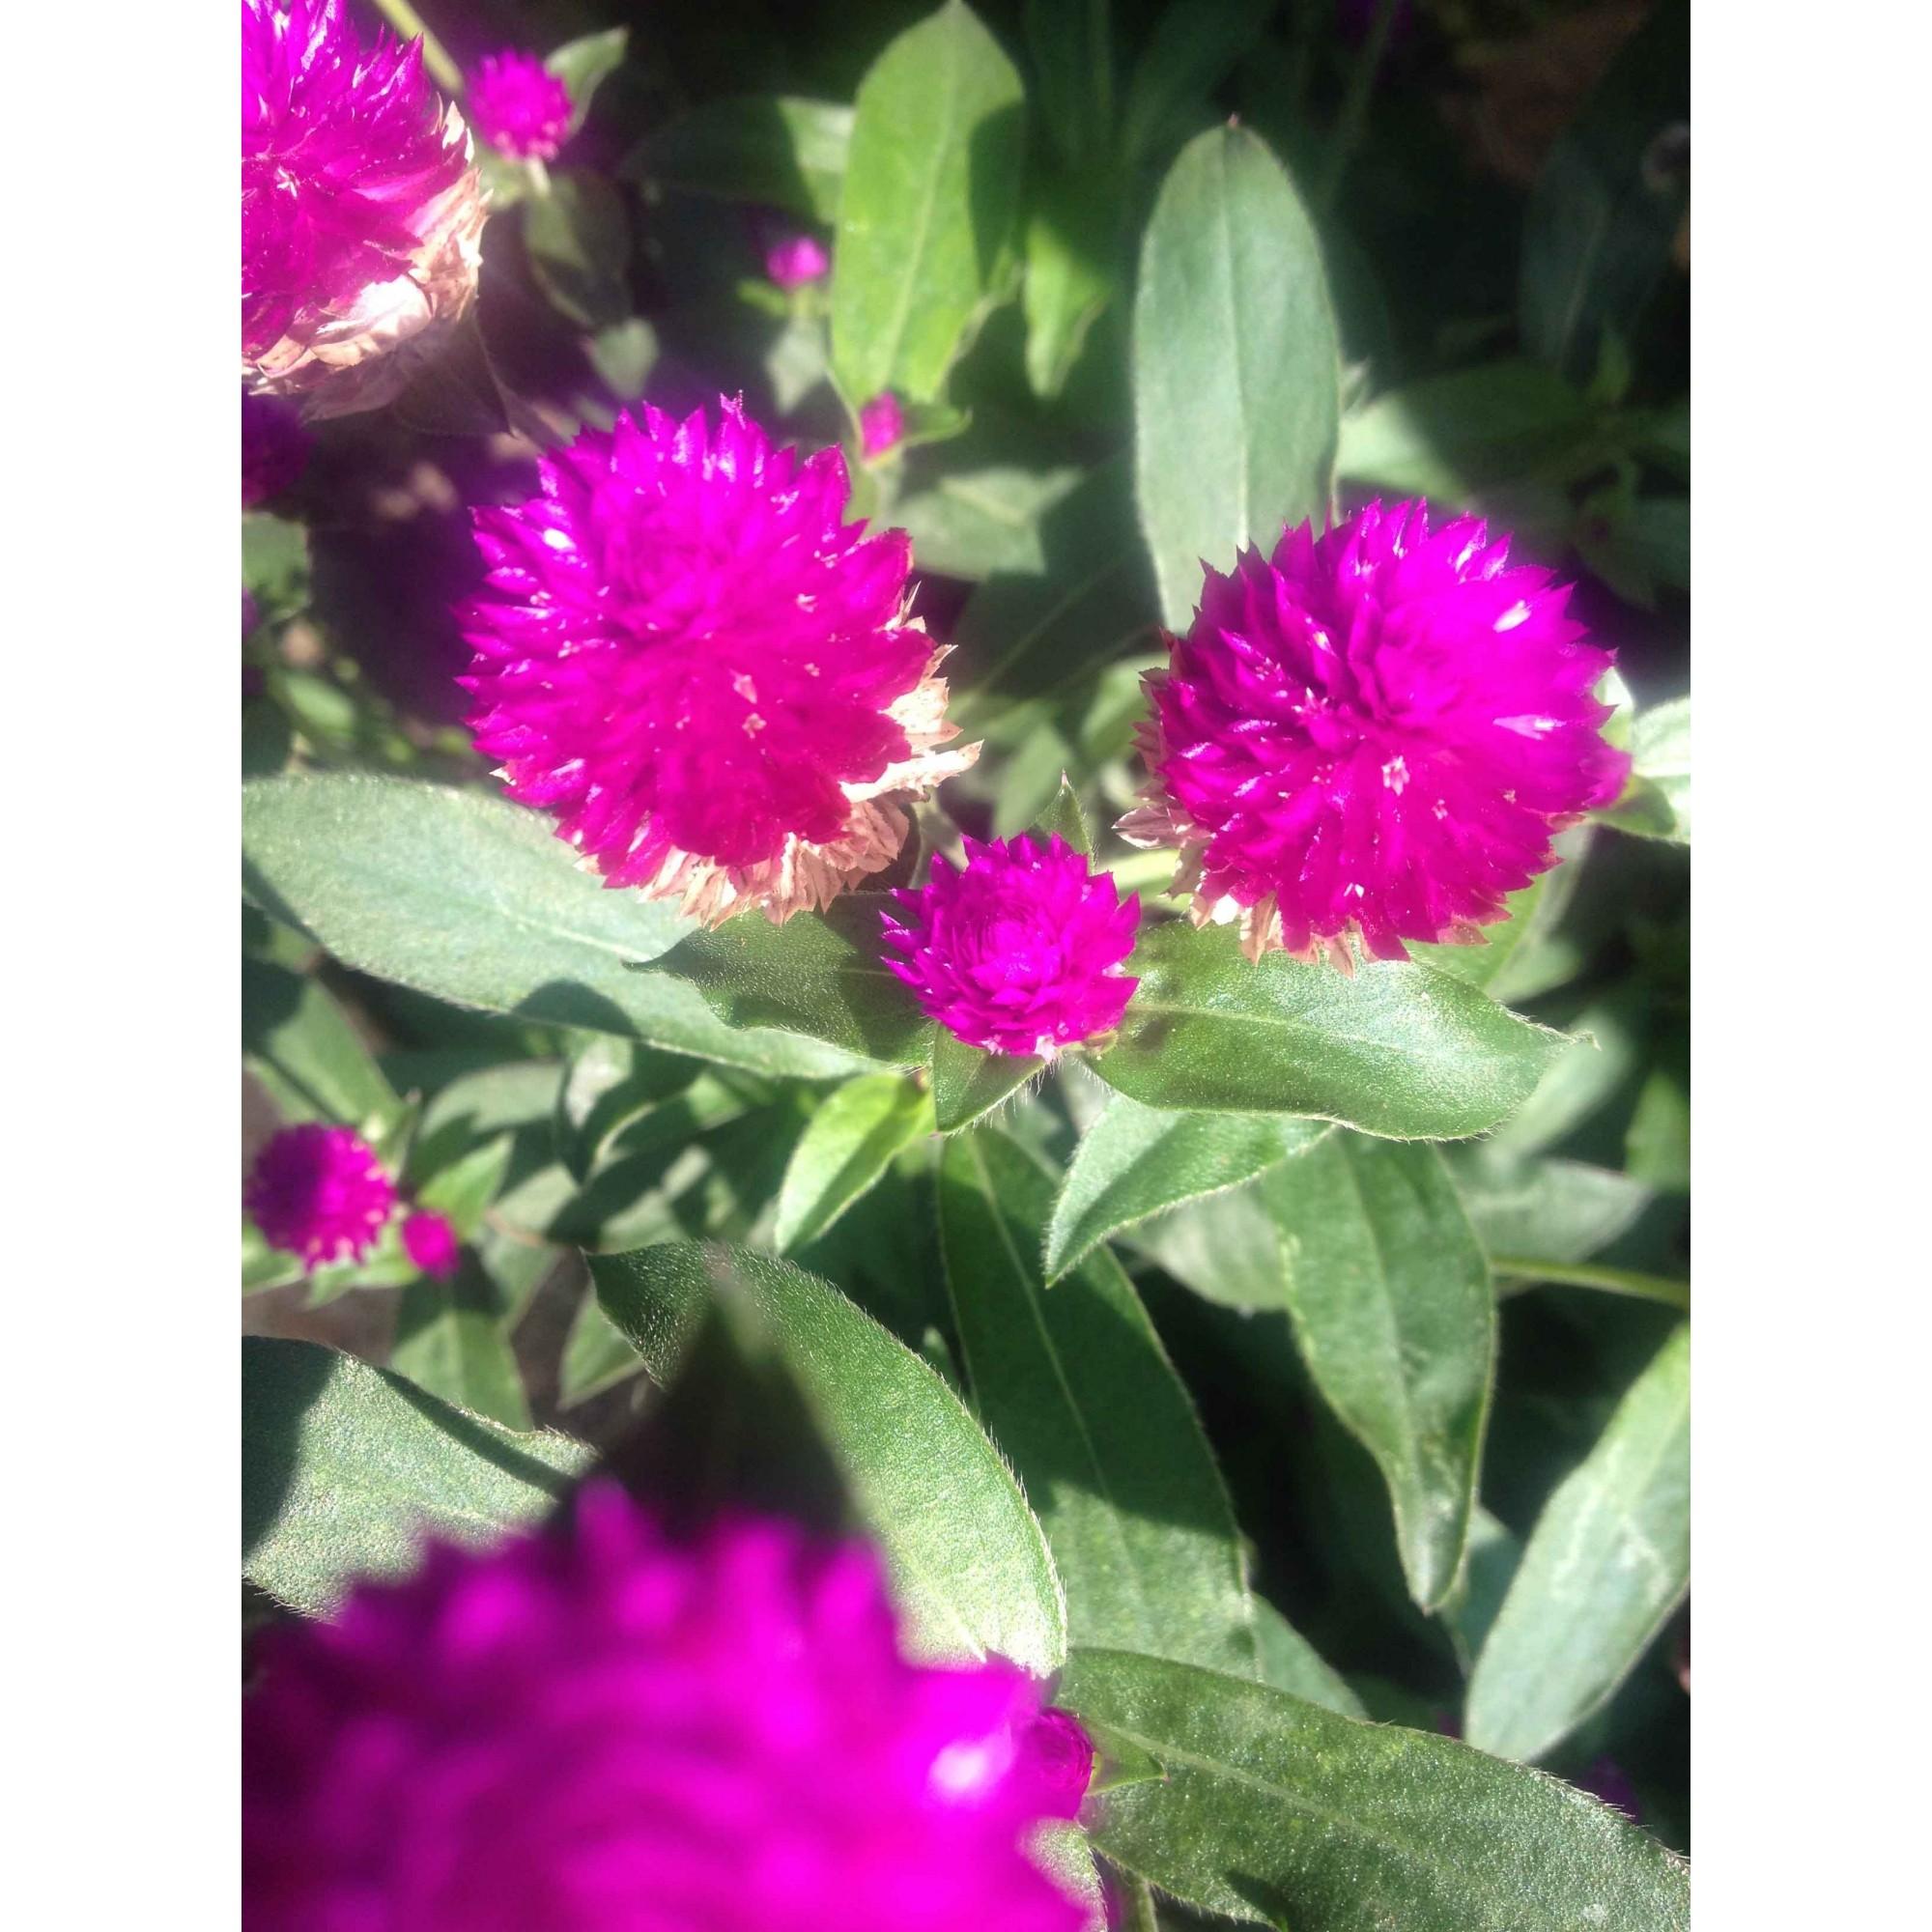 Perpétua - Azas Florais - 10 ml  - Floressência